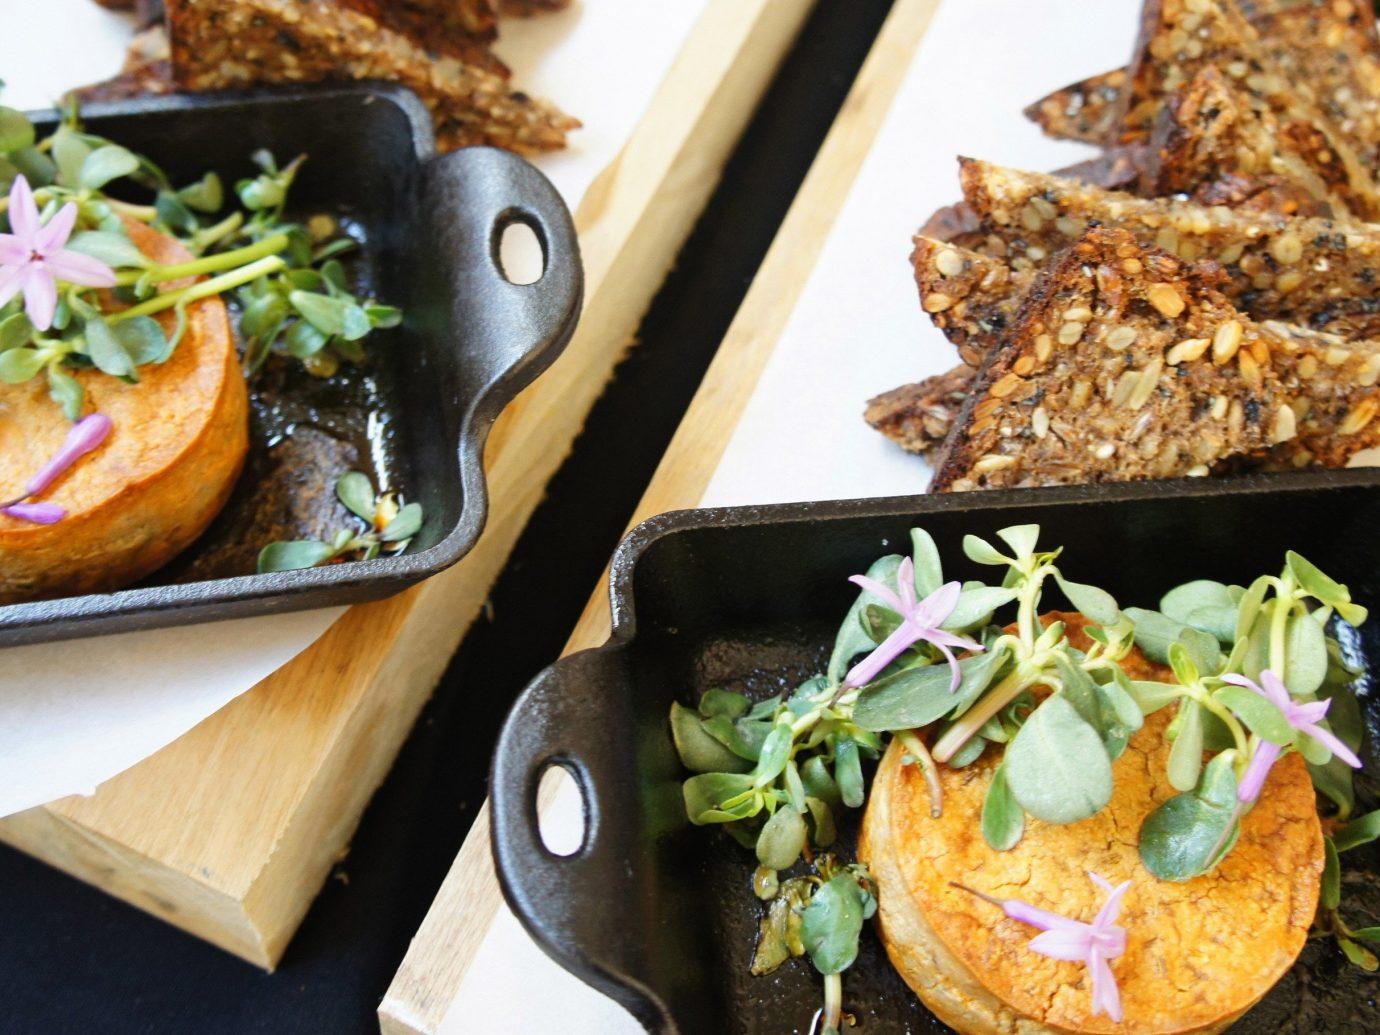 Trip Ideas table food dish meal plate cuisine breakfast lunch produce brunch fruit asian food piece de resistance